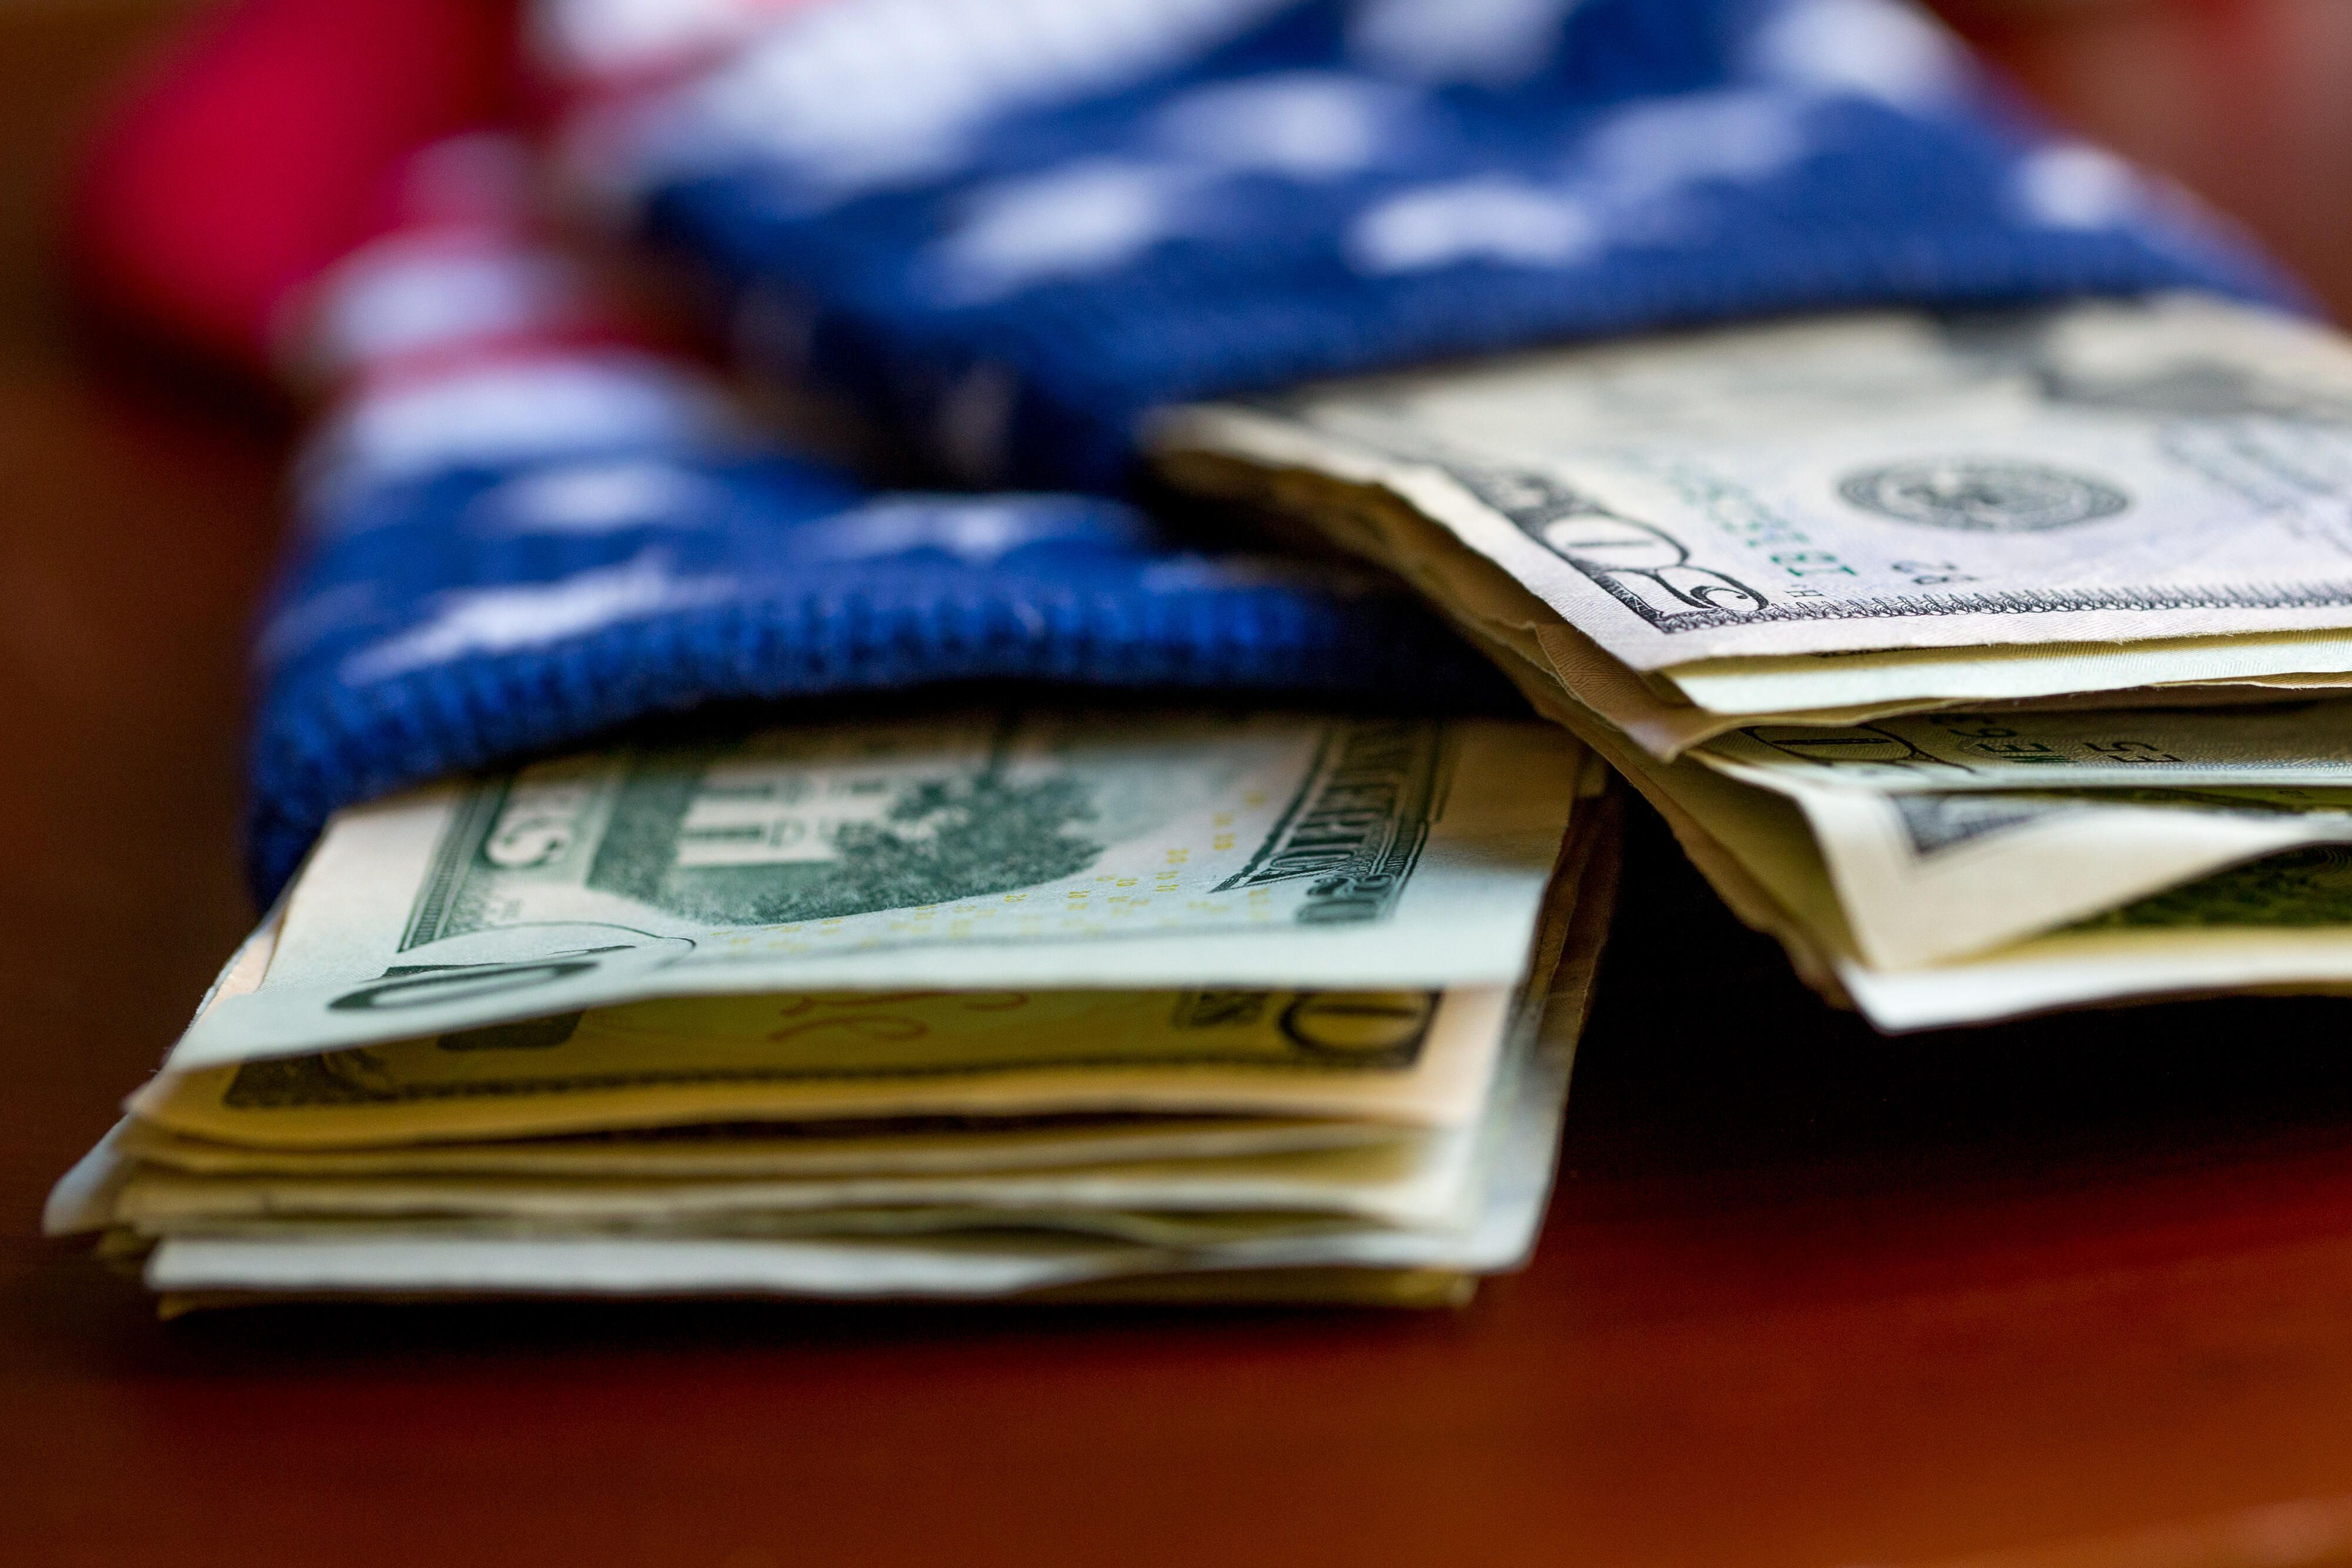 money-dollars-bills-sock-american-flag-9036